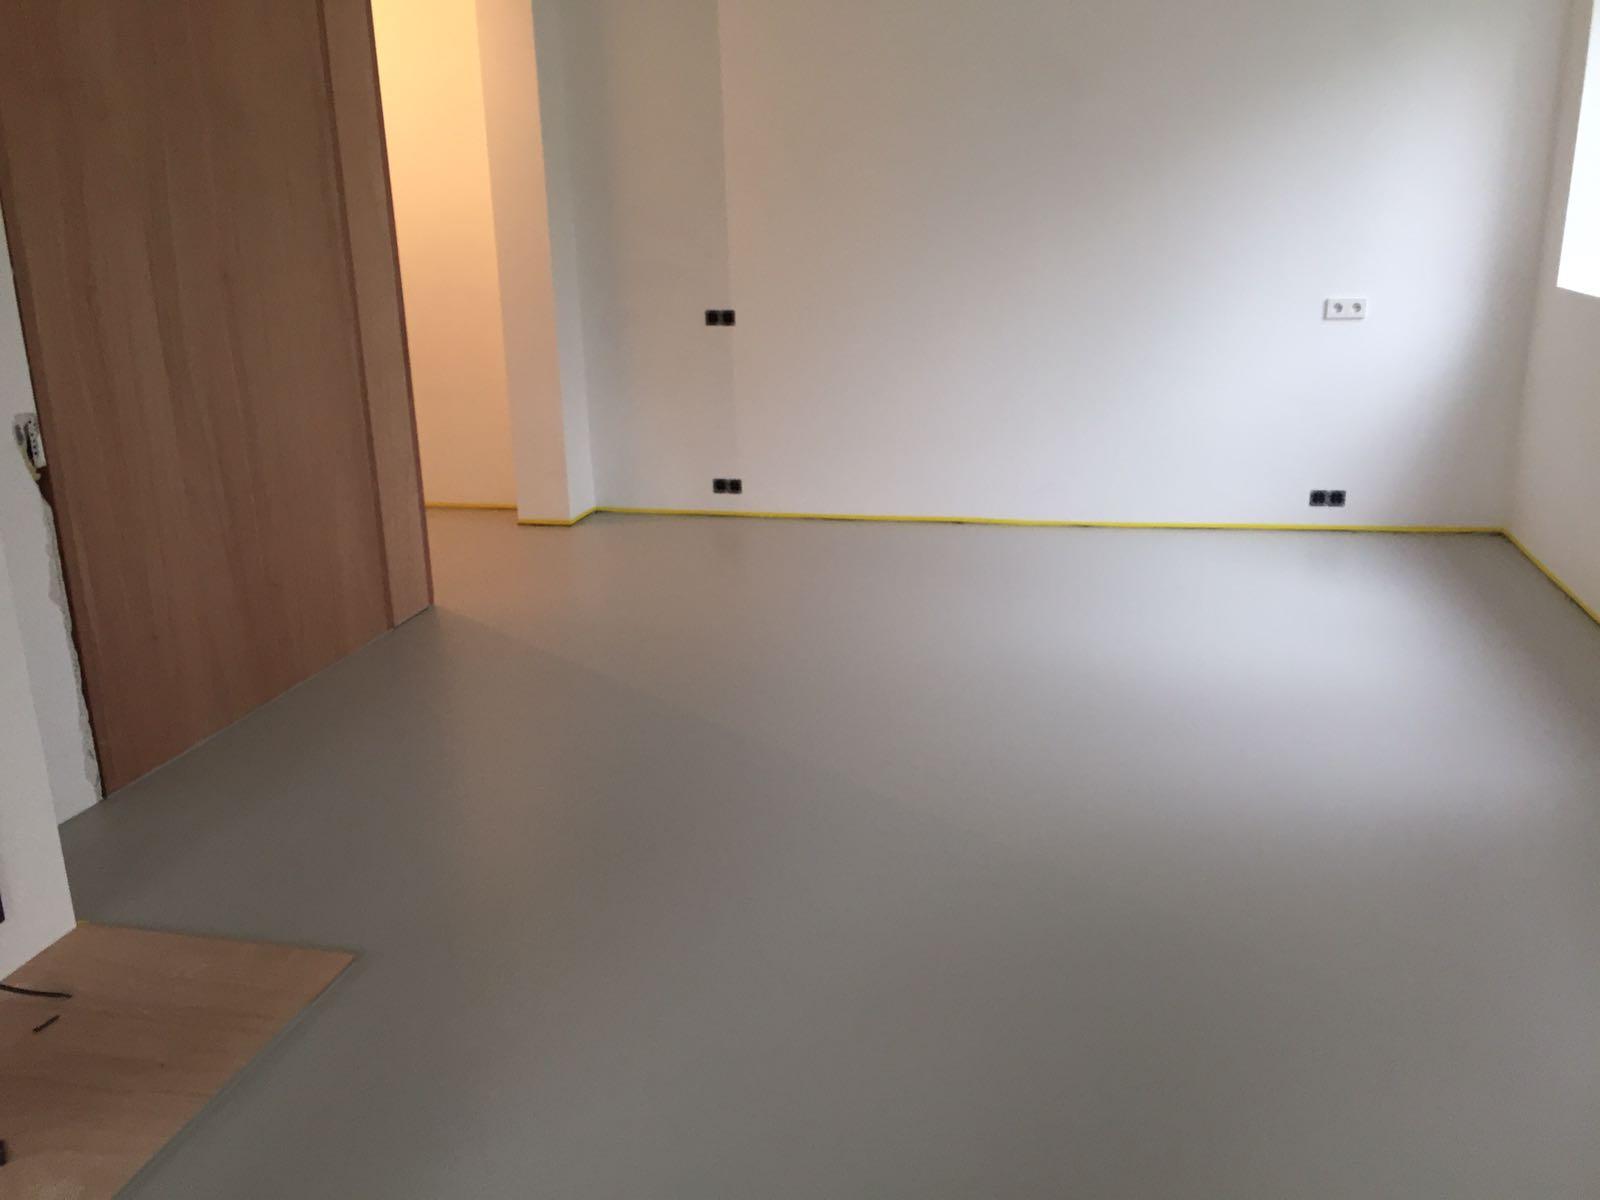 Pu gietvloer amsterdam 125 m2 best vloerrenovatie